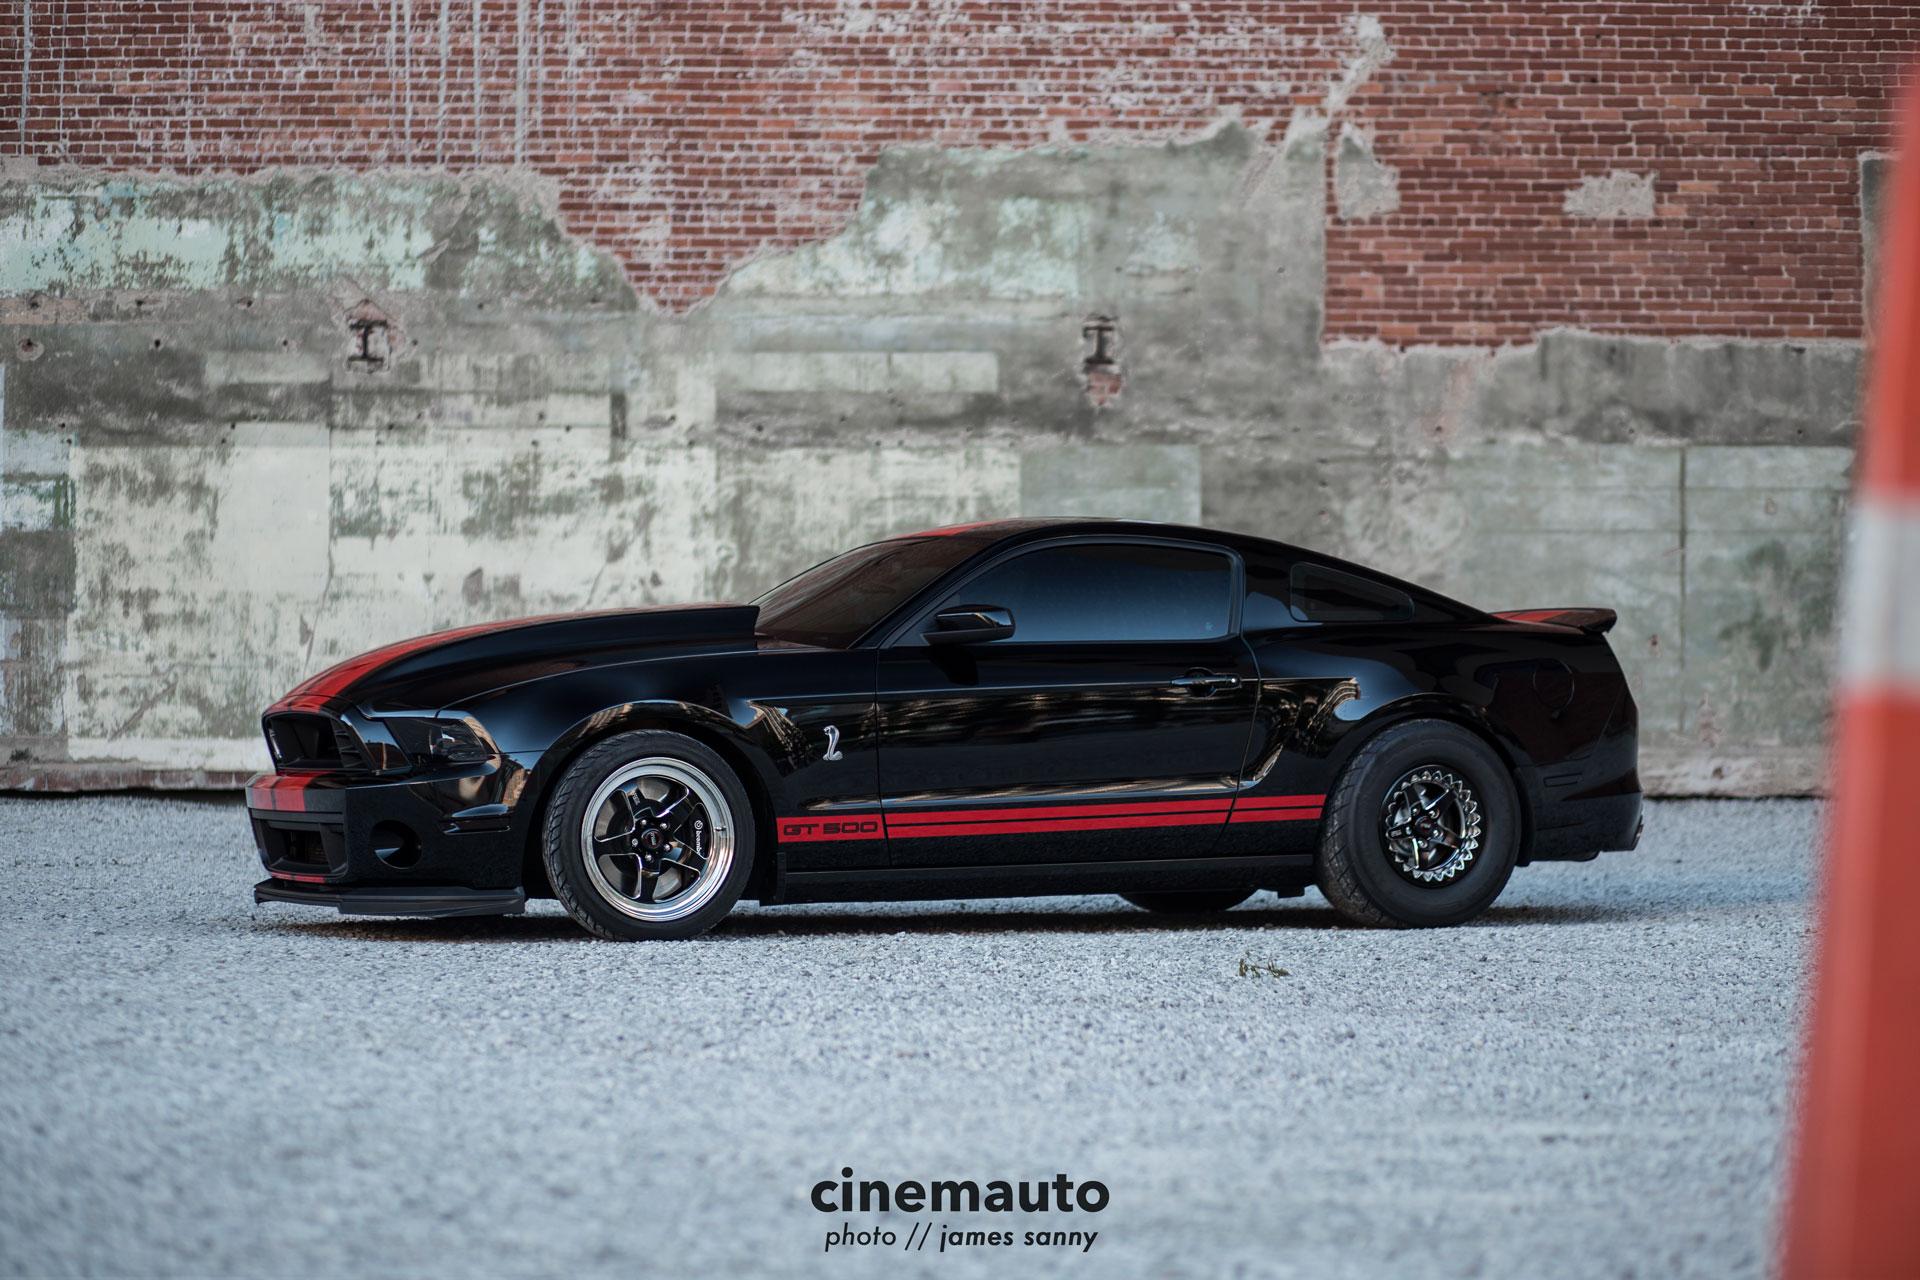 cinemauto-wichita-automotive-photography-cj13a.jpg